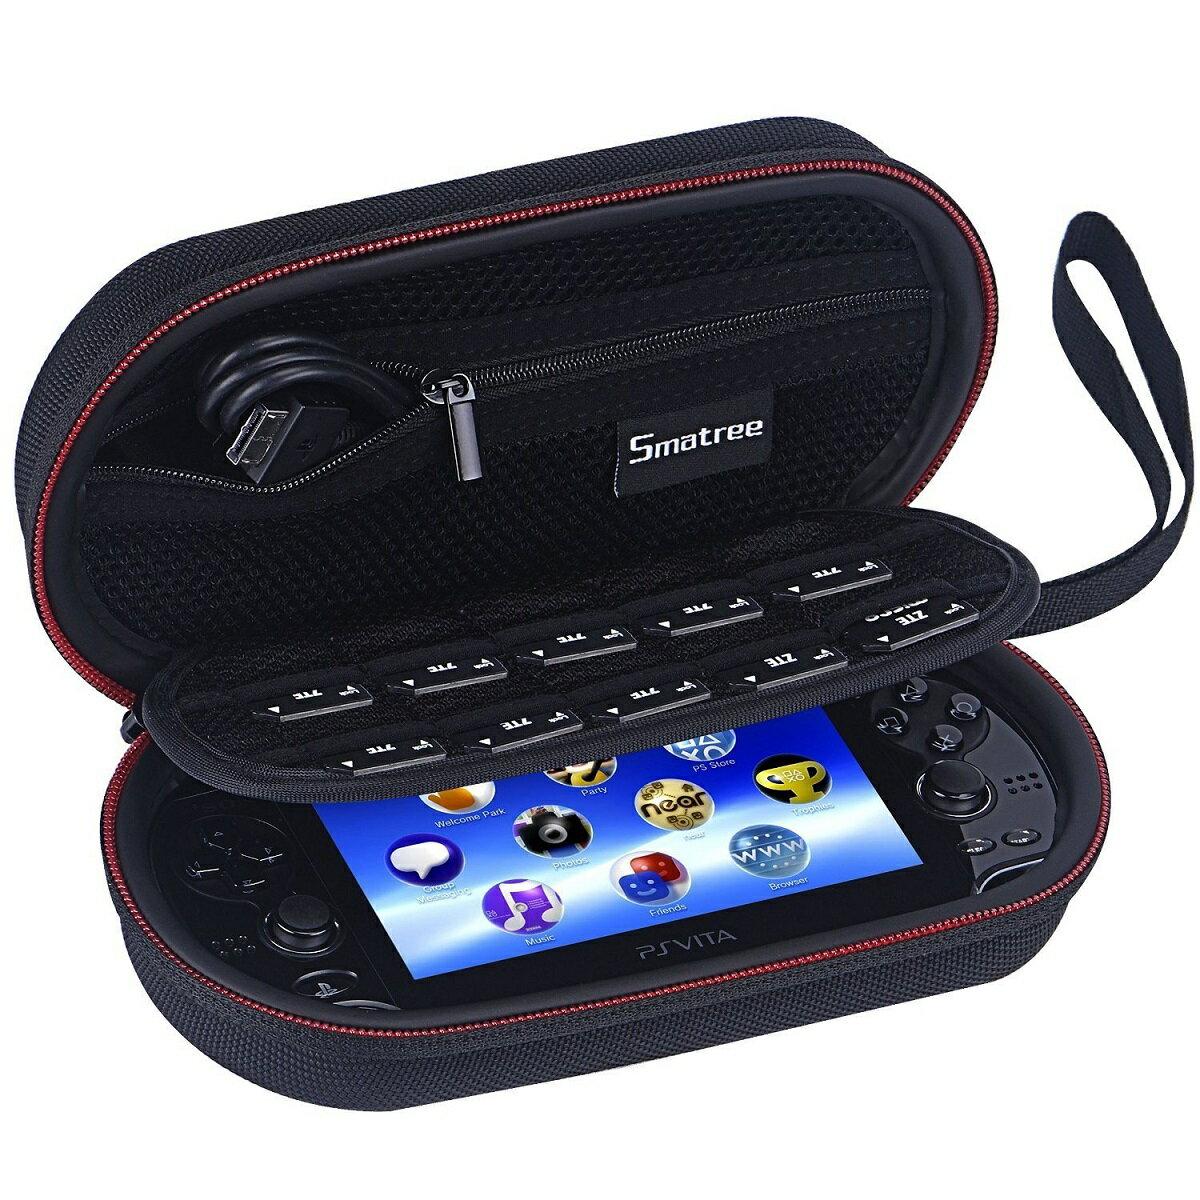 【SONY】PlayStation プレイステーション PS Vita、PS Vita Slim、PS2000 保護ケース、バッグ P-100